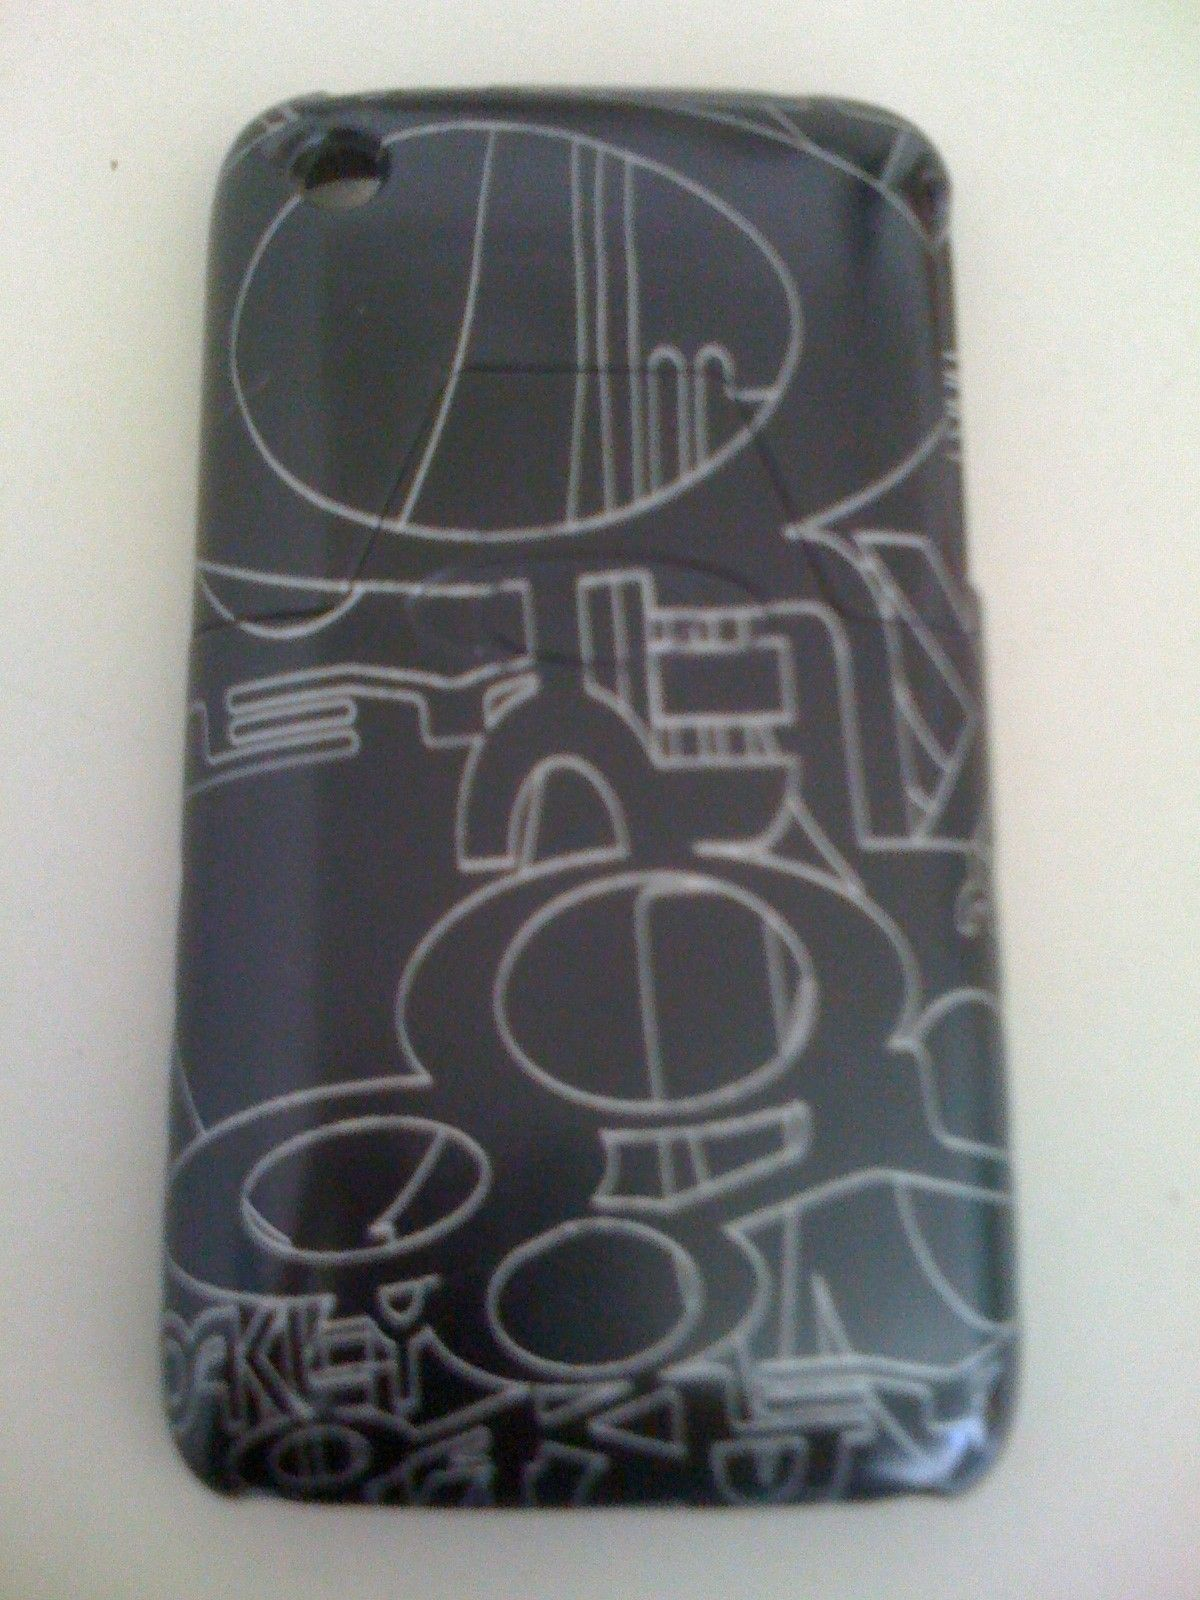 IPhone Case - img1583eo.jpg